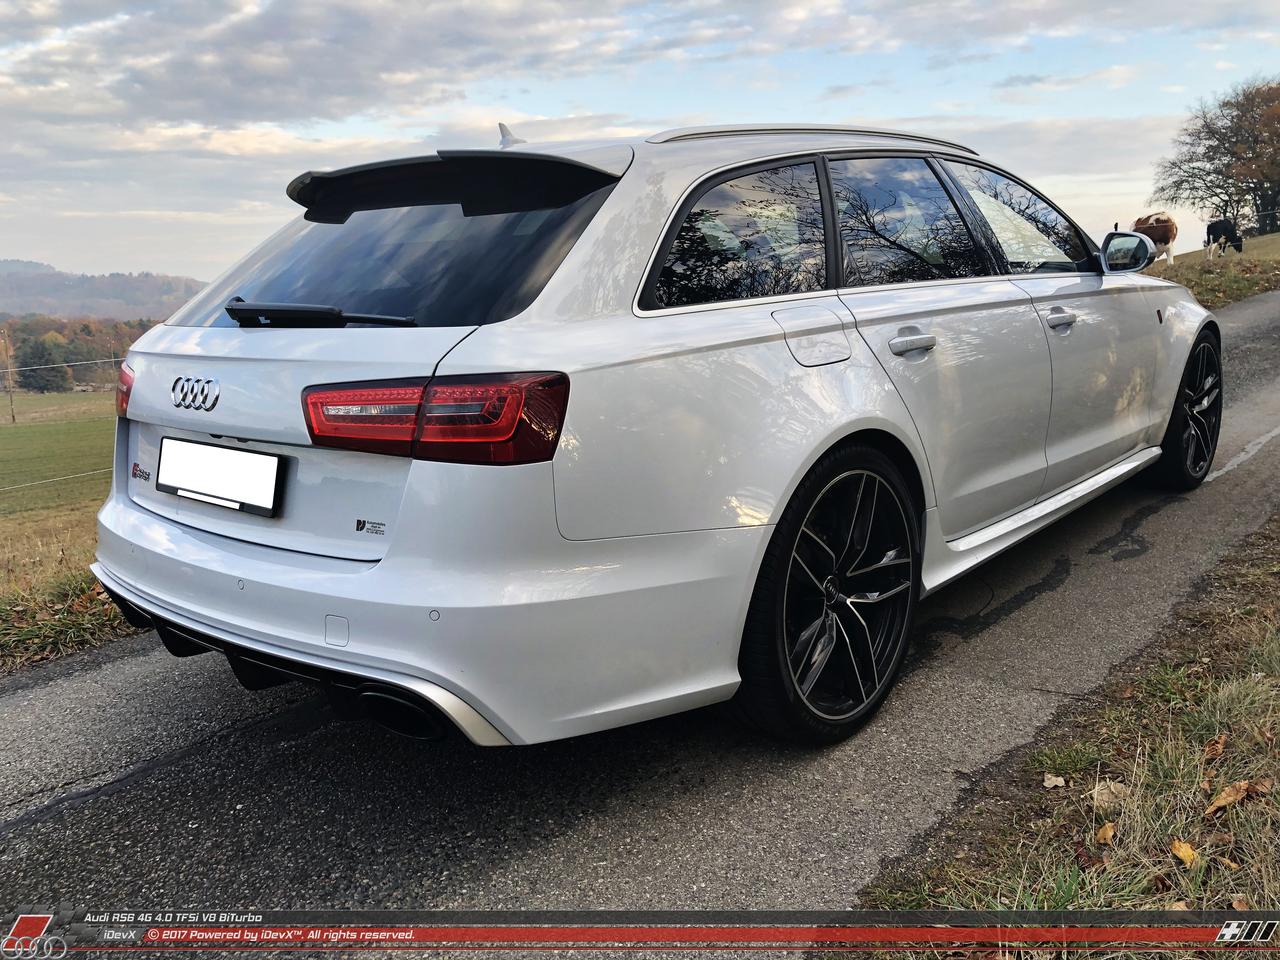 09_11.2018_Audi-RS6_iDevX_007.png